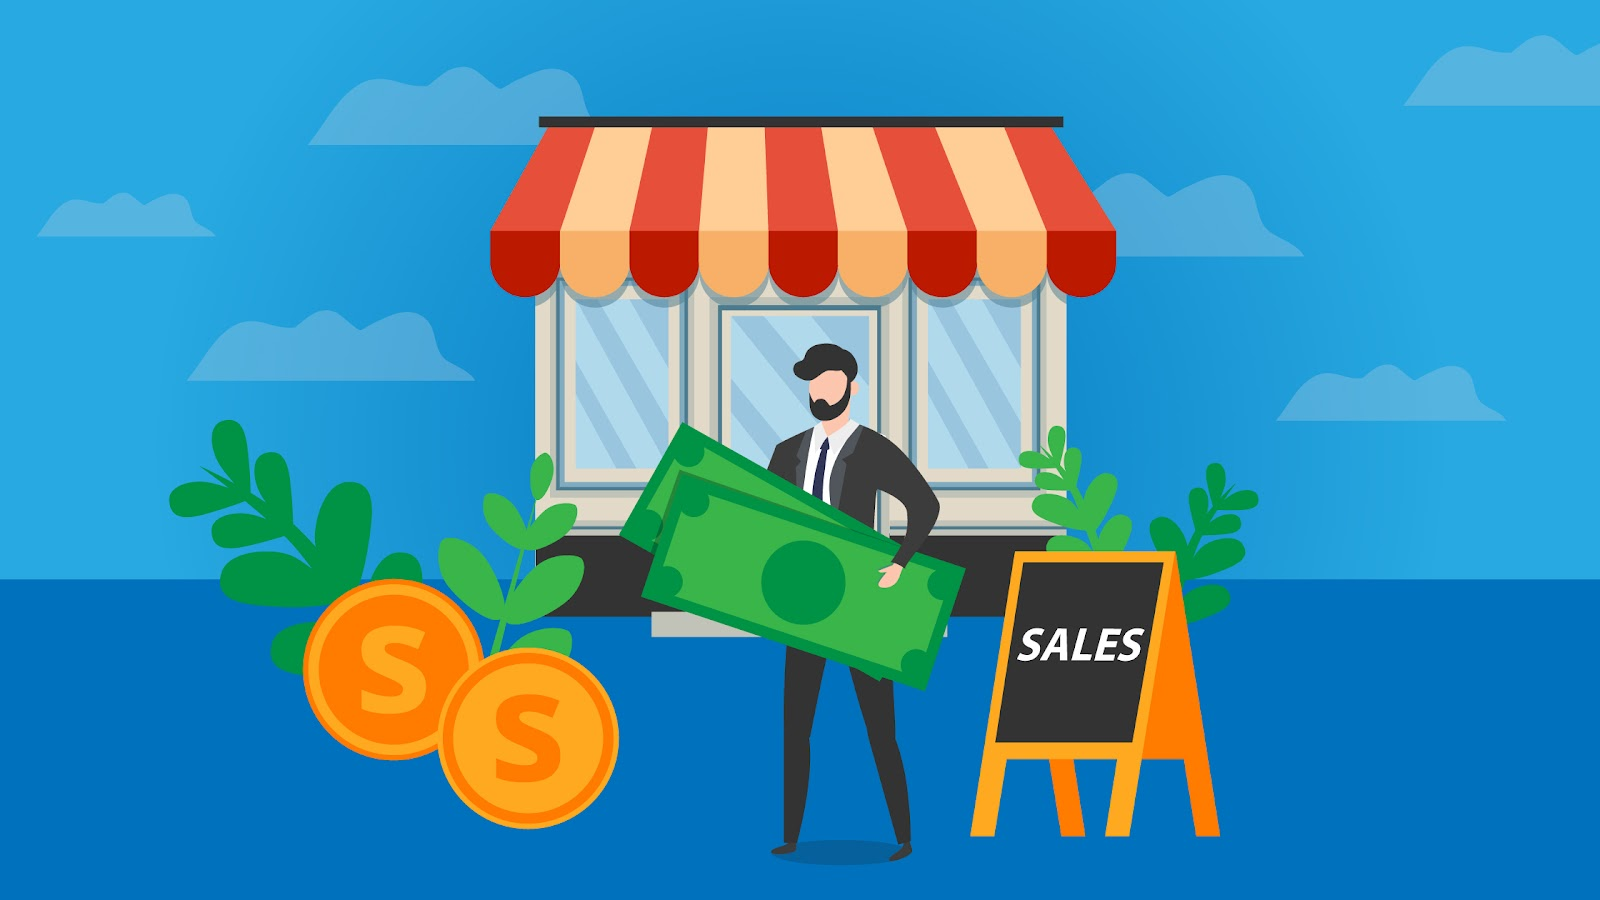 SMB sales